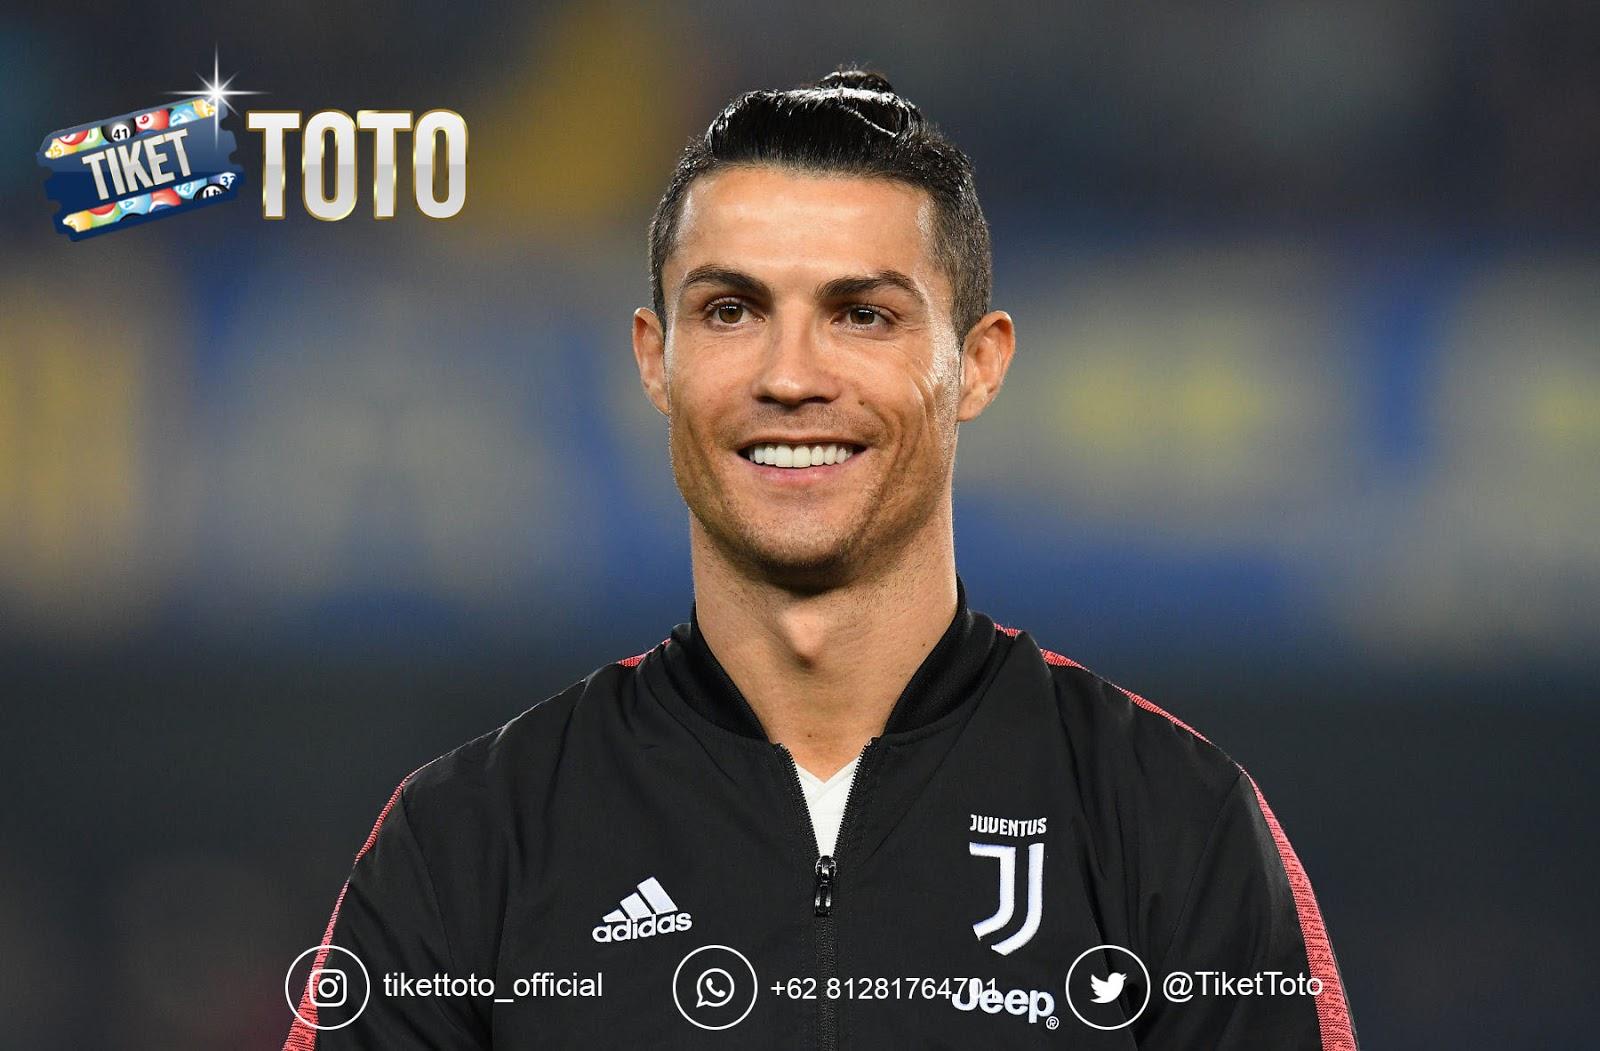 Akhirnya Cetak Gol Tendangan Bebas untuk Juventus, Ini Kata Cristiano Ronaldo